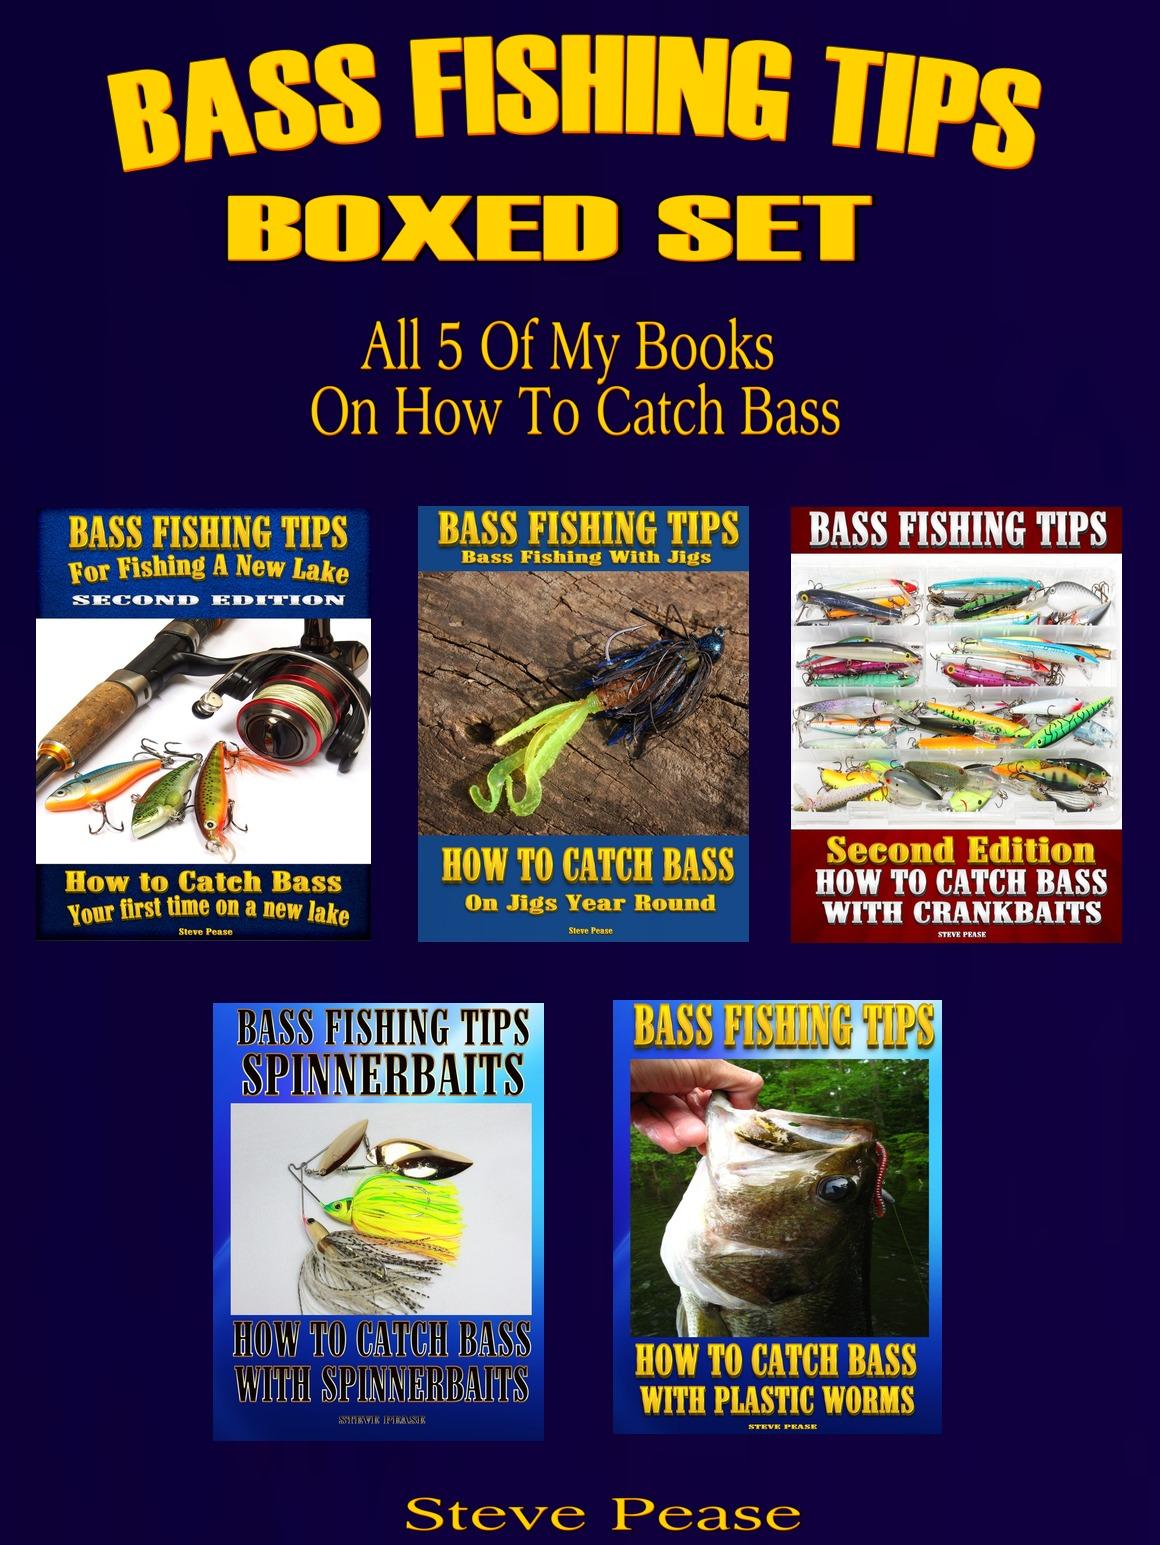 5 BOOK SET ON BASS FISHING